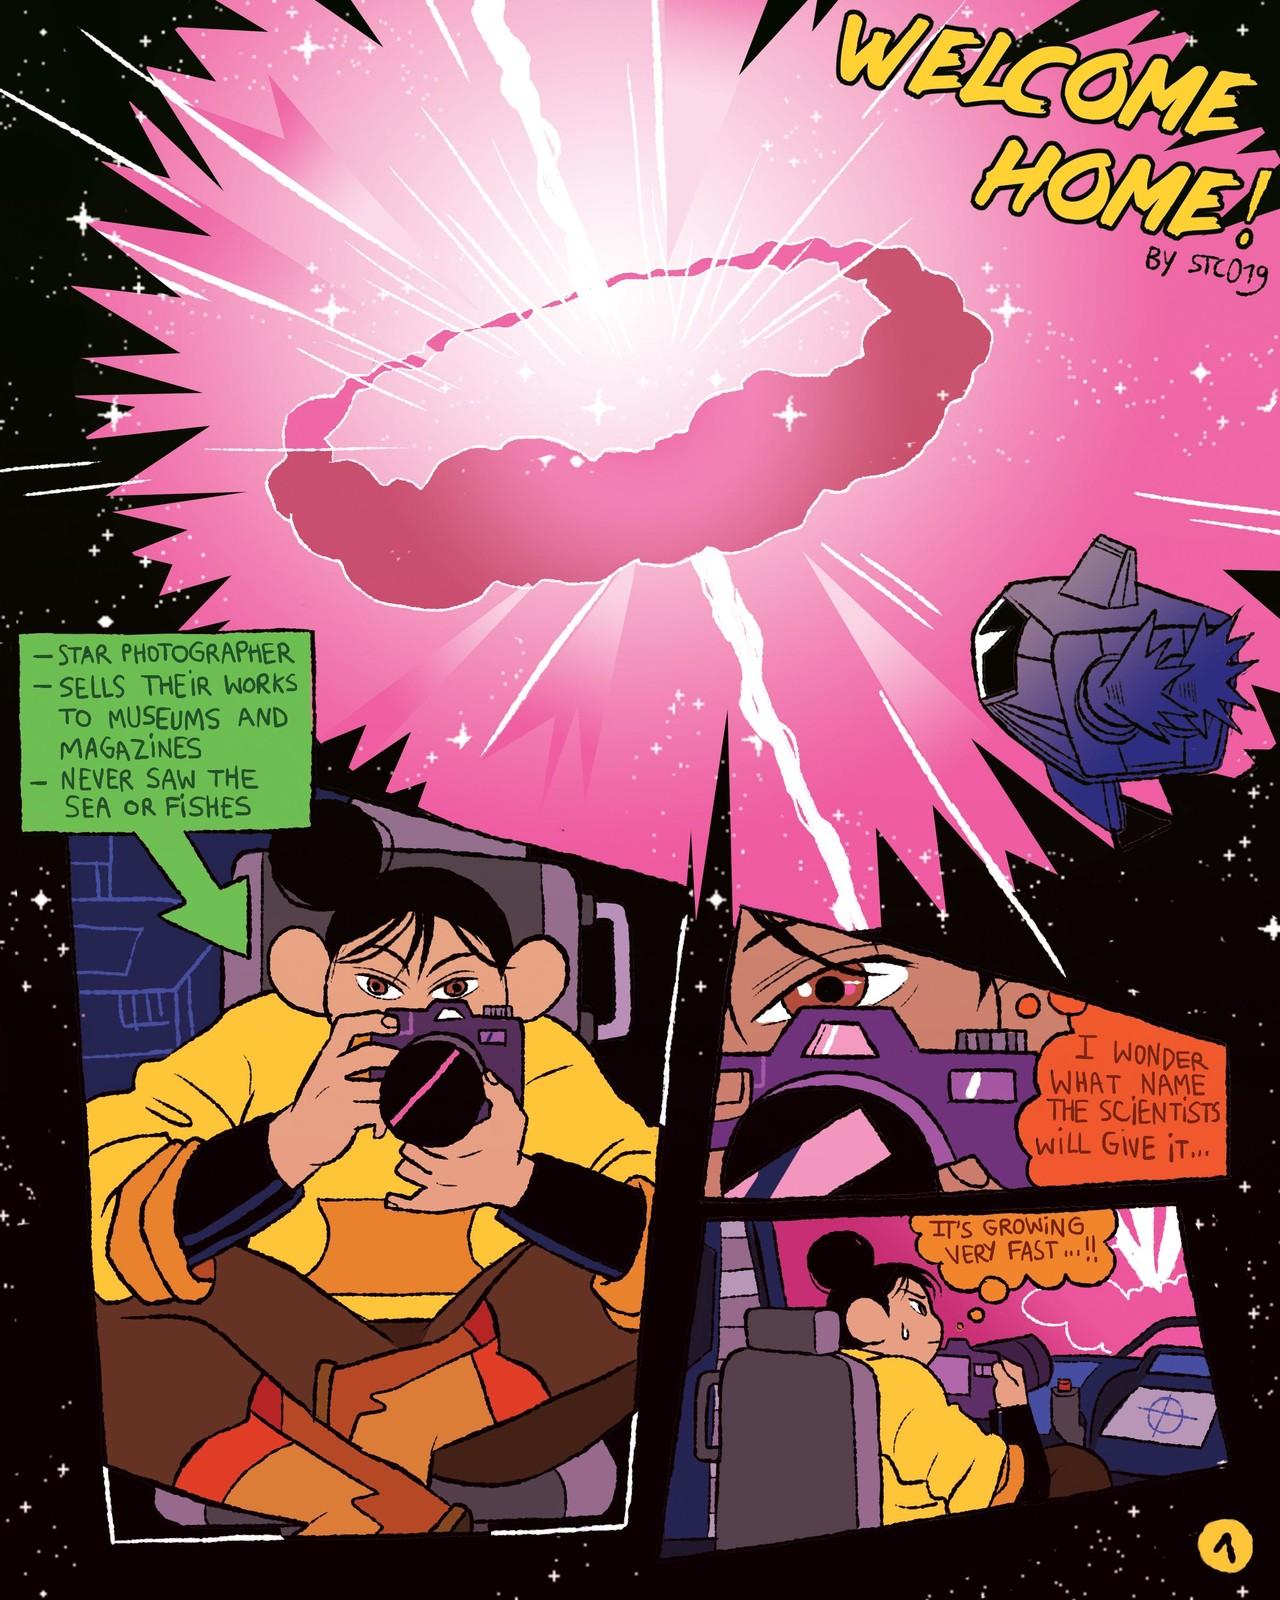 Welcome home! (comic)